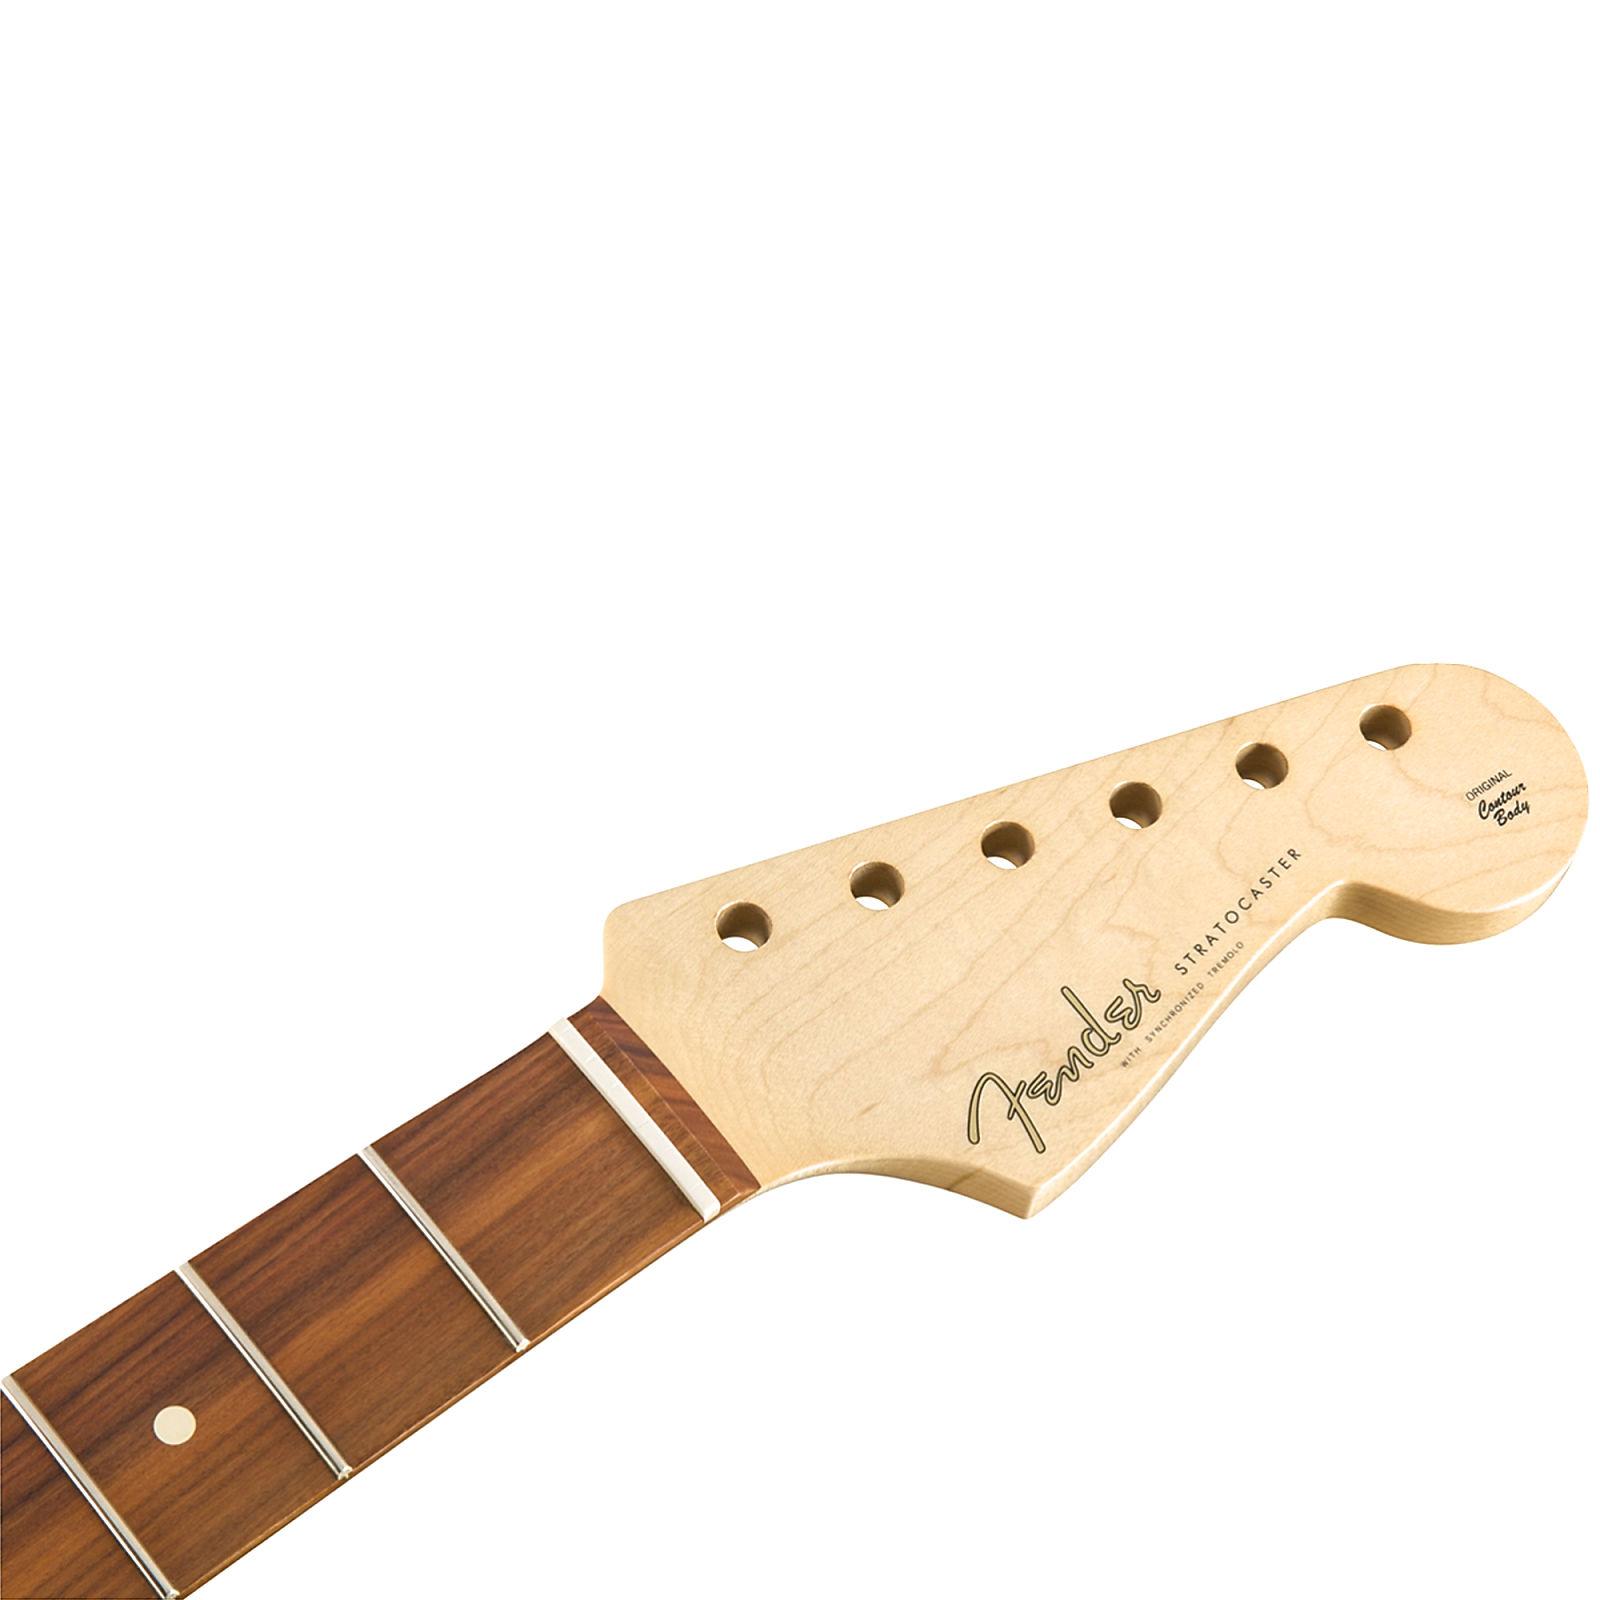 Fender Stratocaster Neck >> Fender Neck 60s Classic Player Stratocaster W Pau Ferro Fingerboard